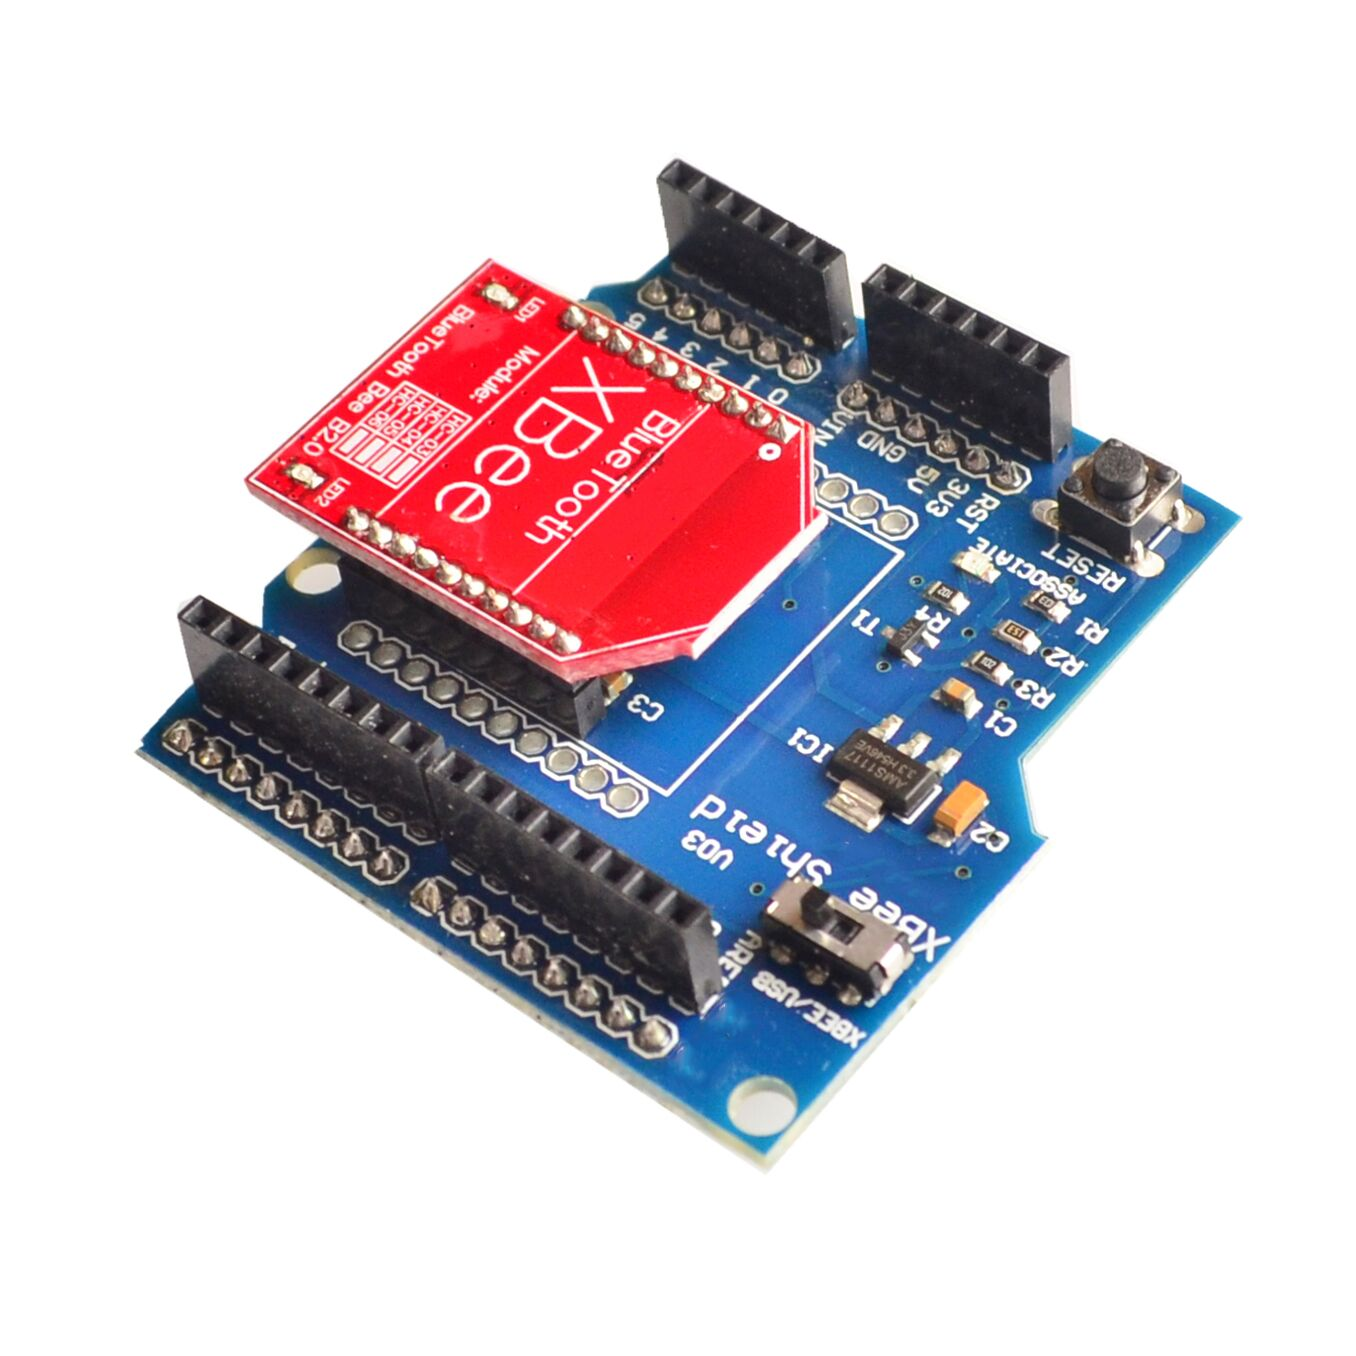 HC-06 RF Wireless Bluetooth Bee V2.0 Module + Xbee V03 Shield Board  WholesaleHC-06 RF Wireless Bluetooth Bee V2.0 Module + Xbee V03 Shield Board  Wholesale